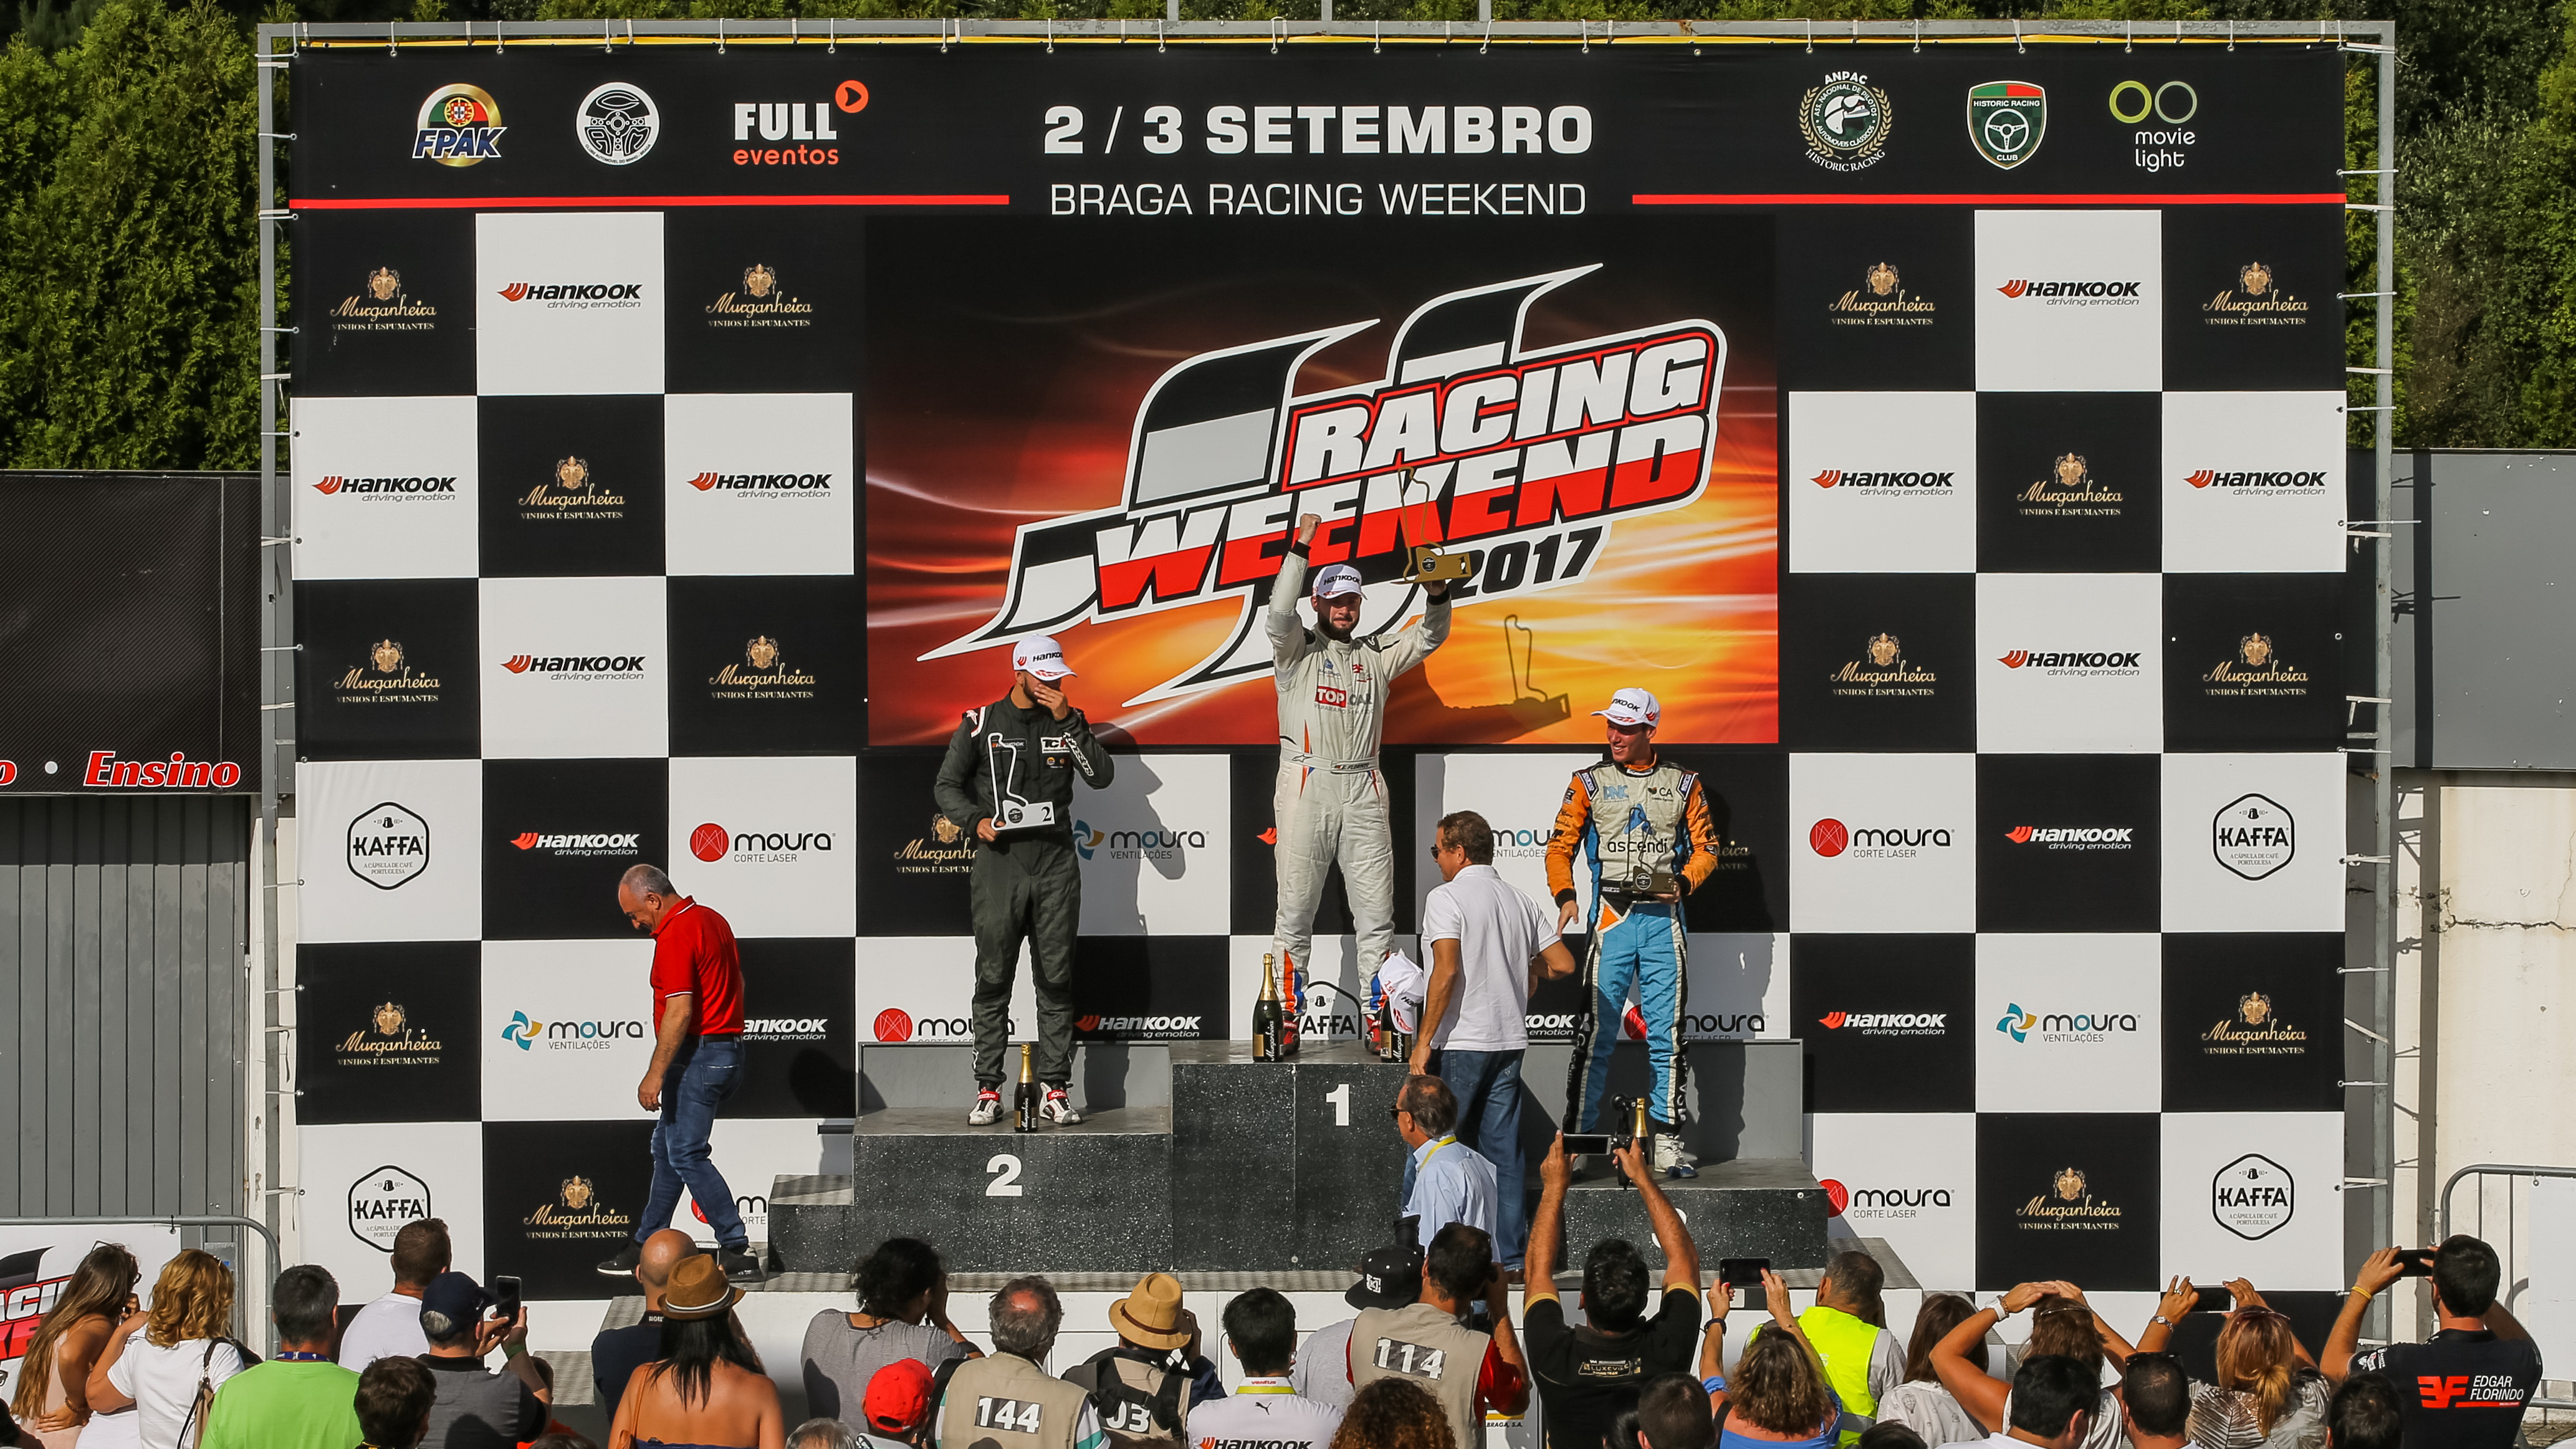 braga podium2